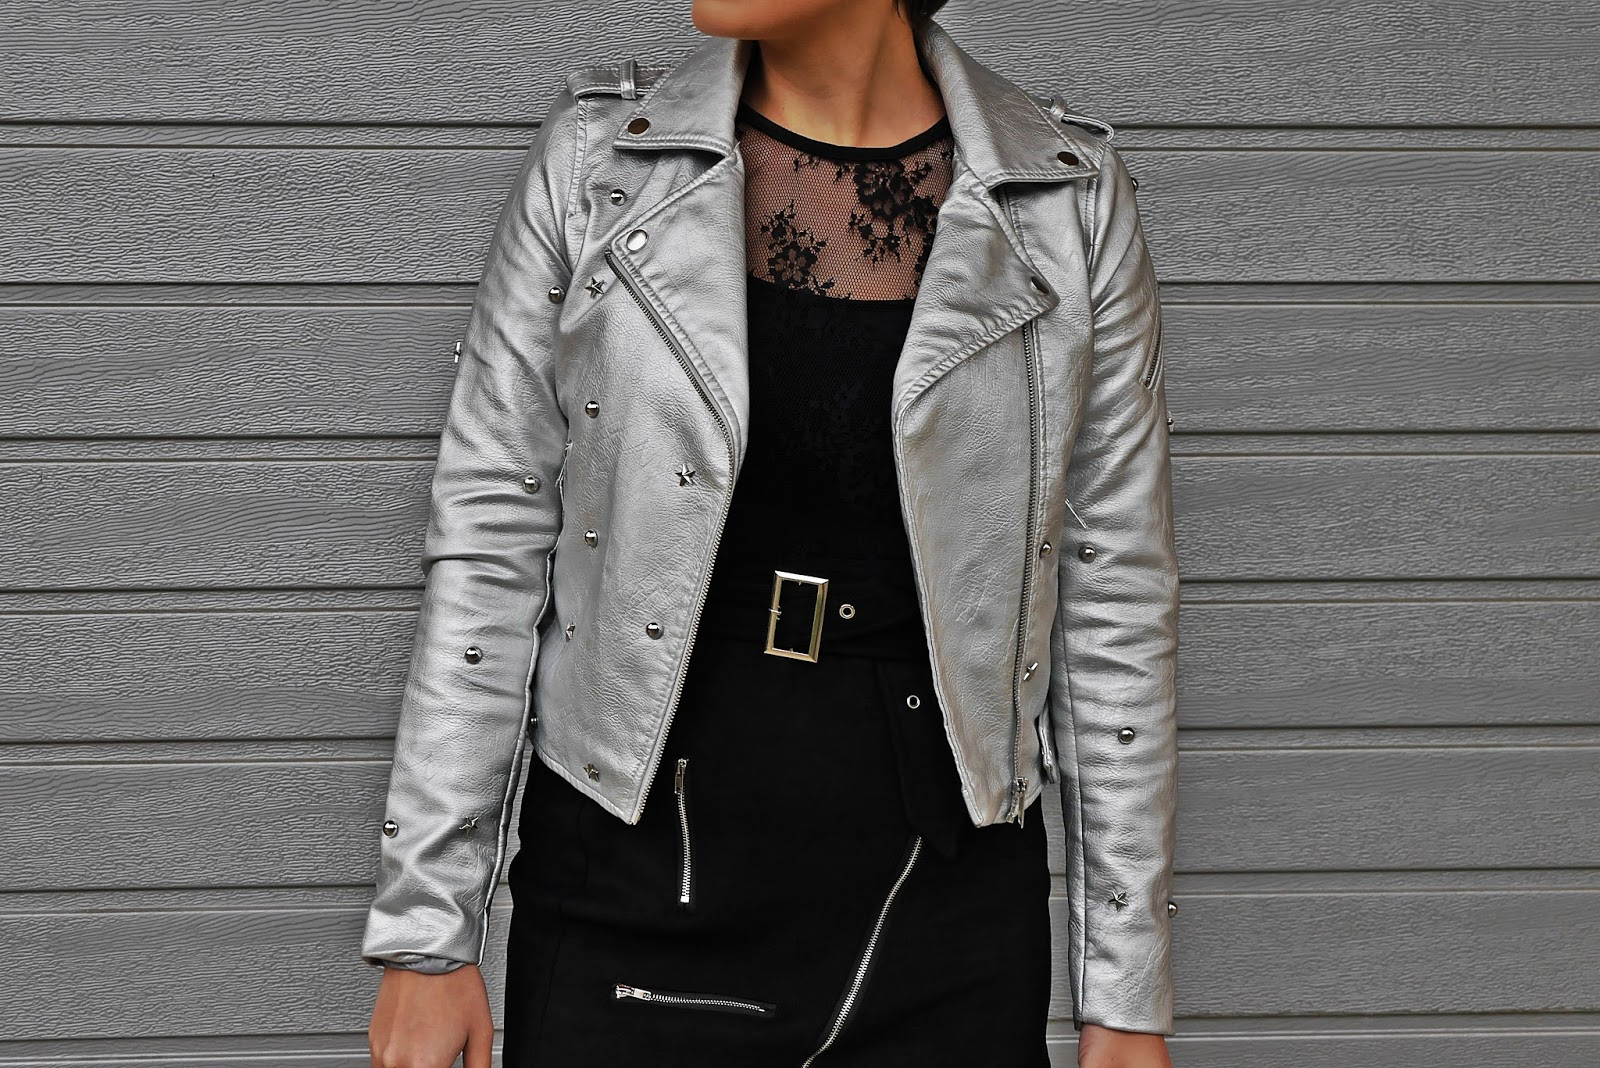 4_silver_biker_jacket_asimetric_skirt_karyn_blog_modowy_091017a